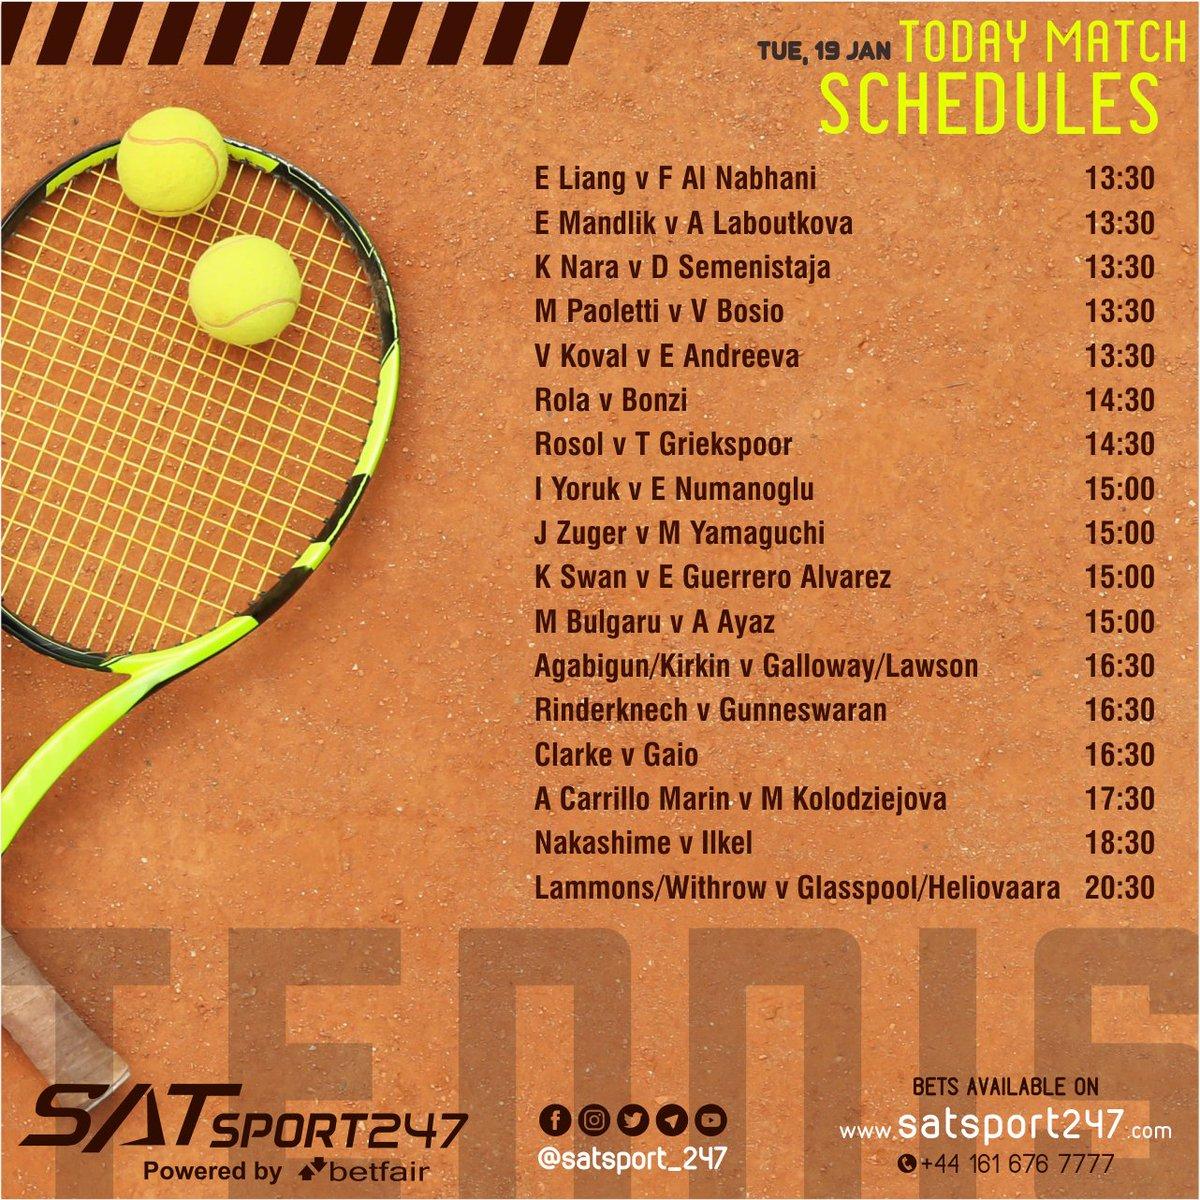 "SatSport 247 gives everyone an ""important update""  Game Schedule🤩🤩  Tennis 🎾  ✔️Sign Up - Free!! 🤩 ✔️Self ID Making 🤩 ✔️Minimum Deposit - 500/- ✔️Minimum Withdrawal - 500/-  Self Deposit and Withdrawal   Contact Now -  +44-1616767777 #Tennis #rafaelnadal #Rogerfederer"